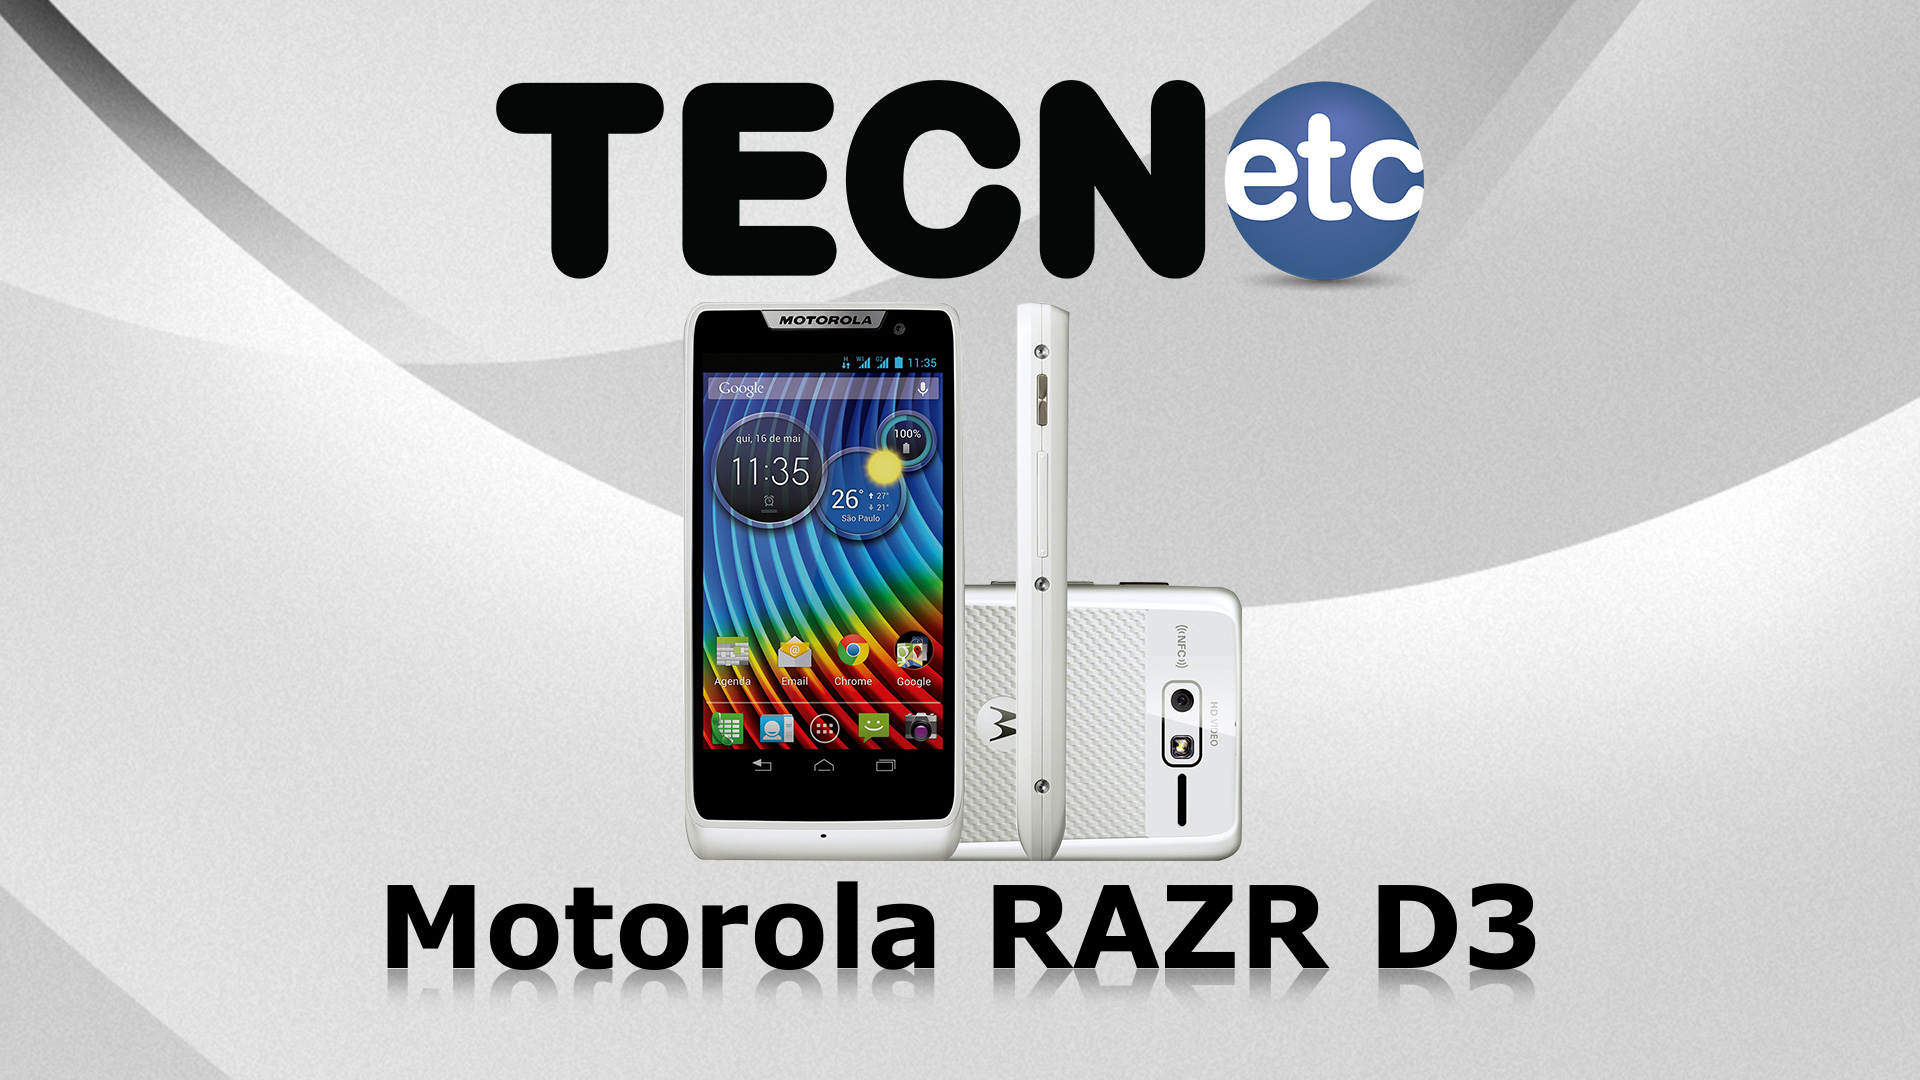 Motorola RAZR D3: Unboxing e Review